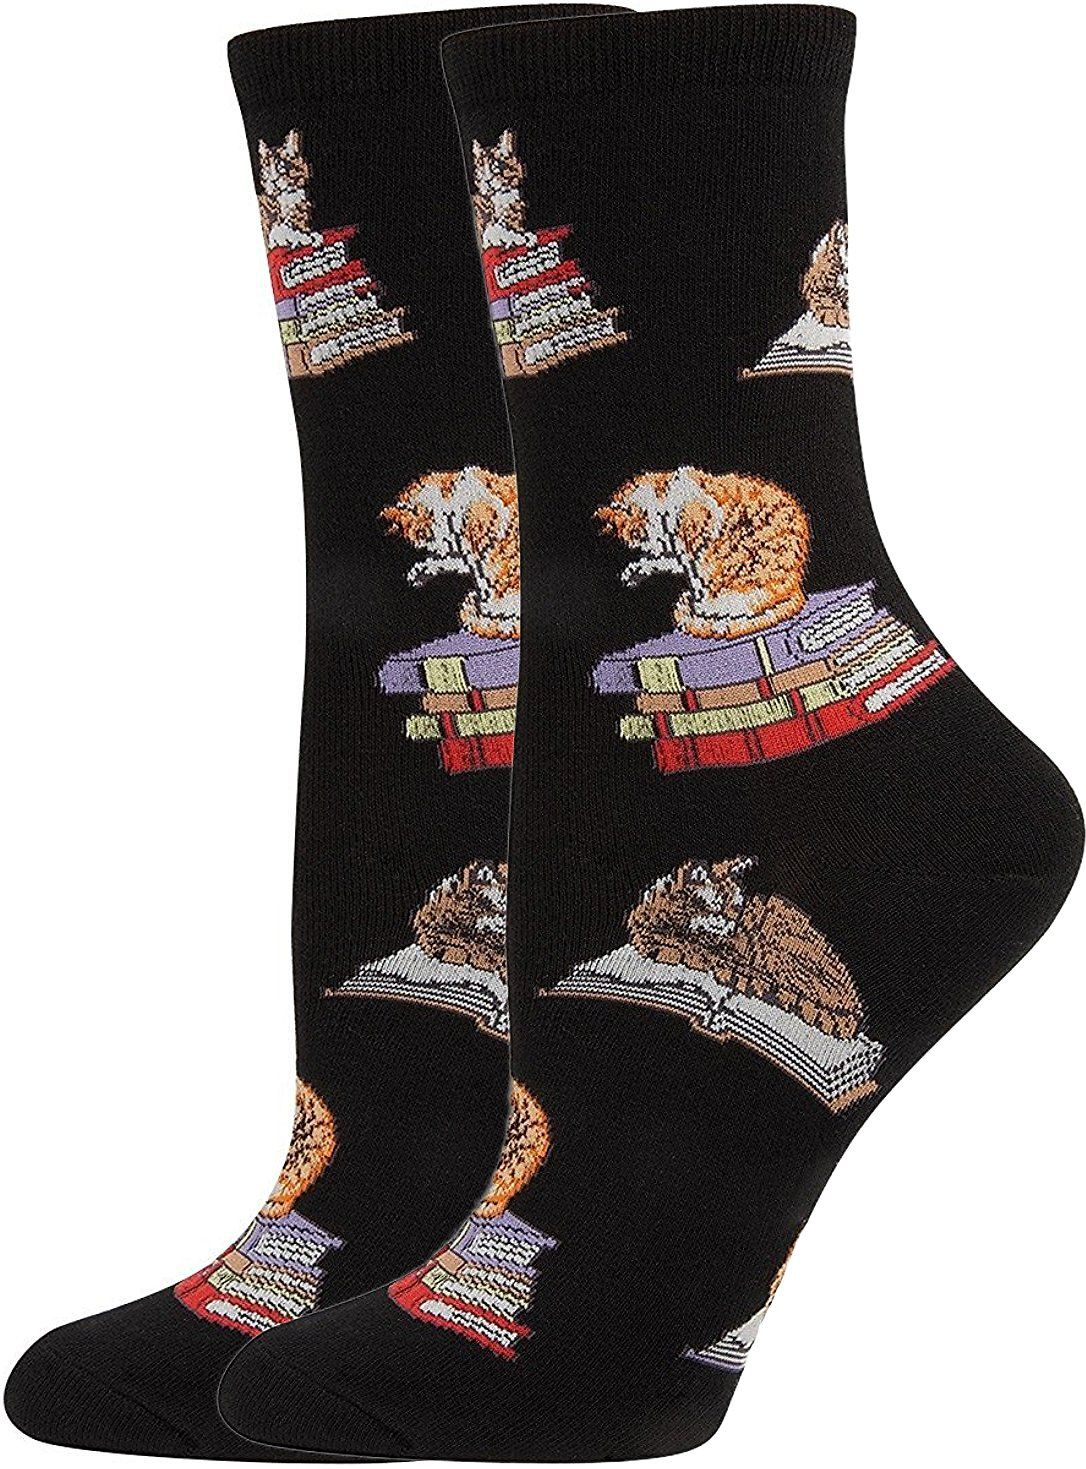 Socksmith Women's Cats On Books Crew Socks, Black Chewy